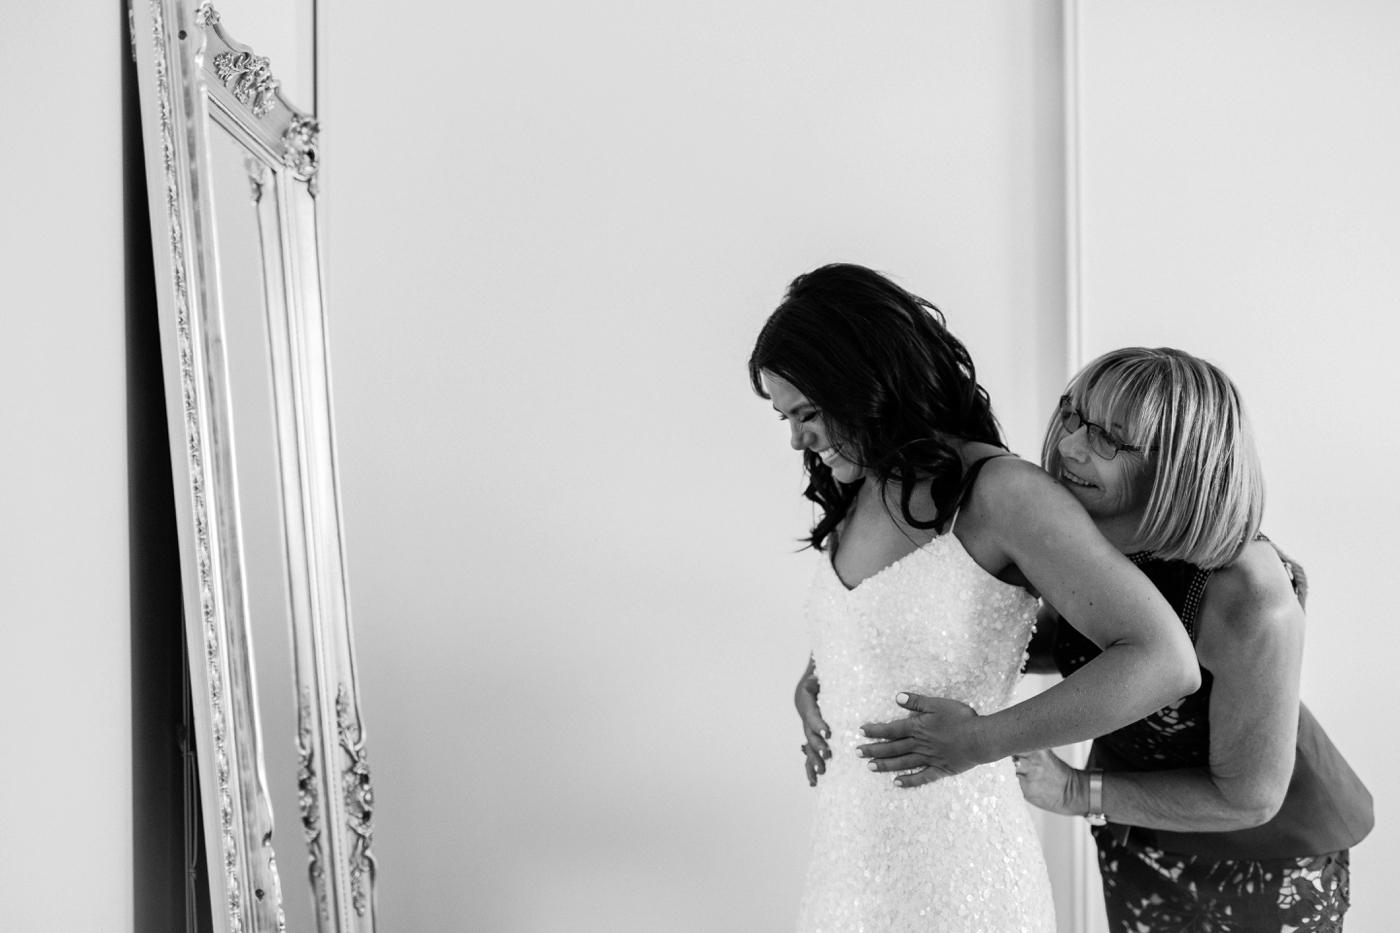 Kellie & Brent - Adelaide City Wedding - Natural wedding photography in Adelaide - Katherine Schultz - www.katherineschultzphotography.com 8